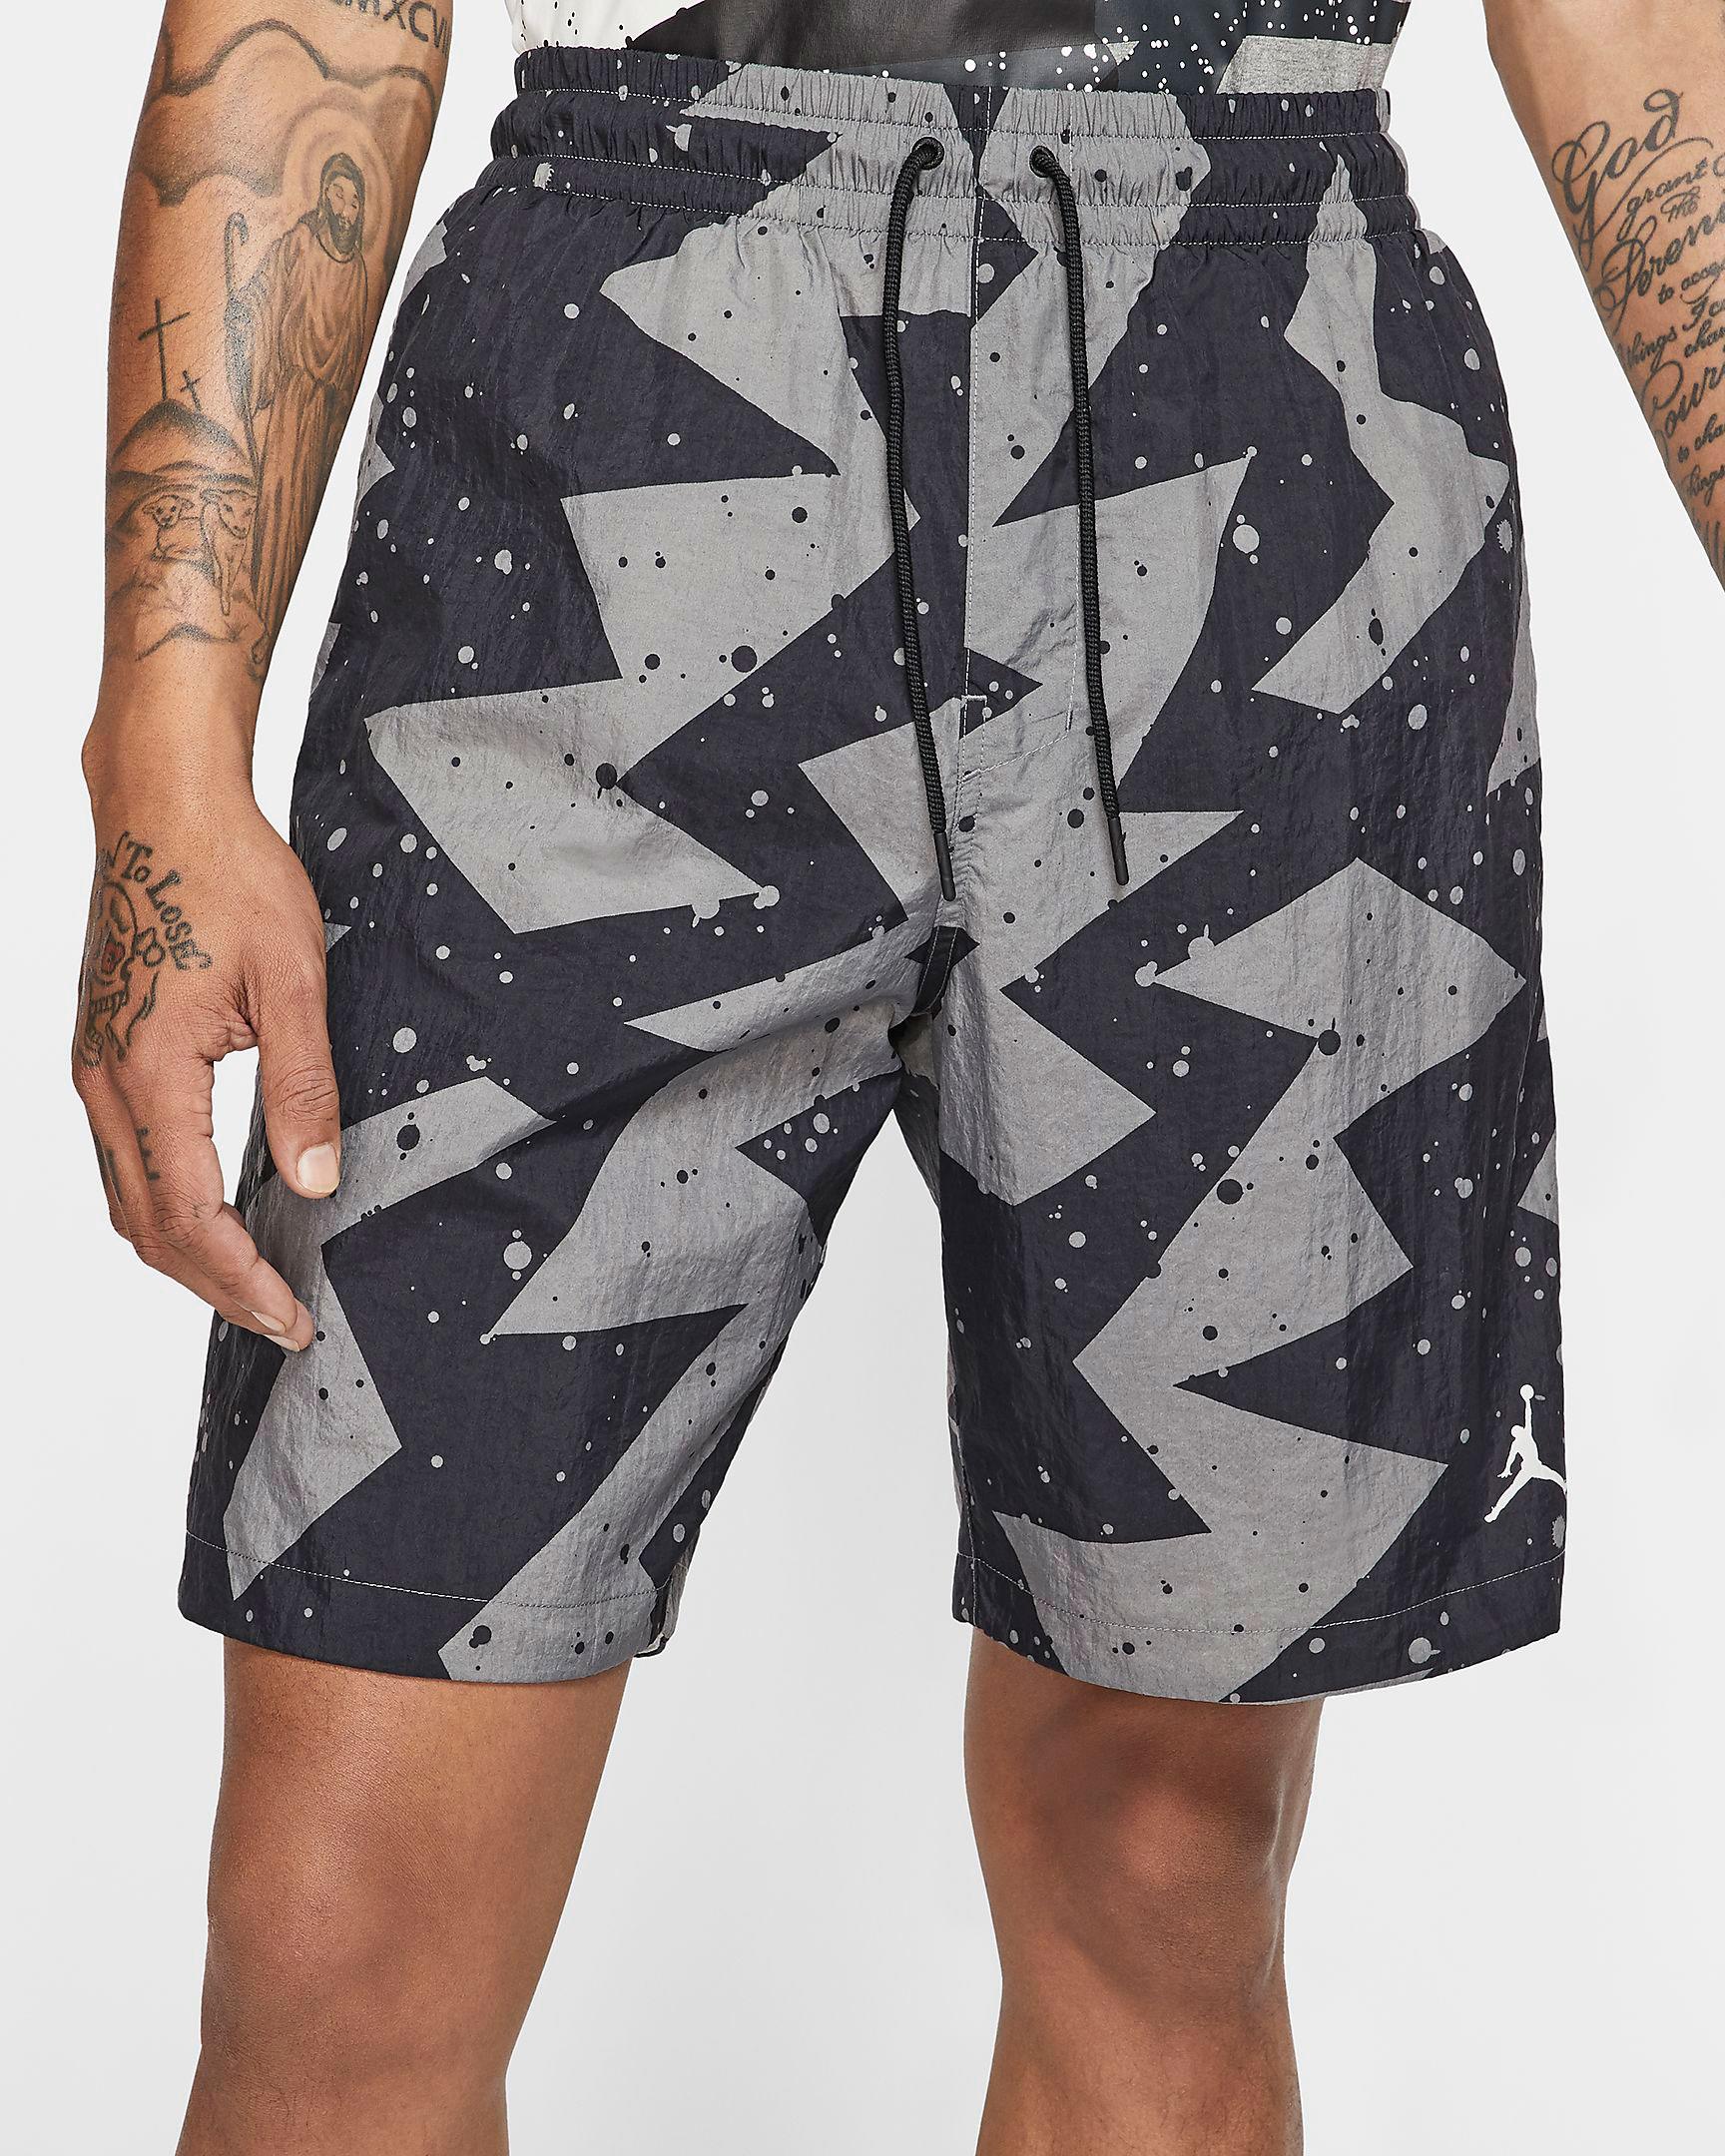 jordan-13-flint-poolside-shorts-1